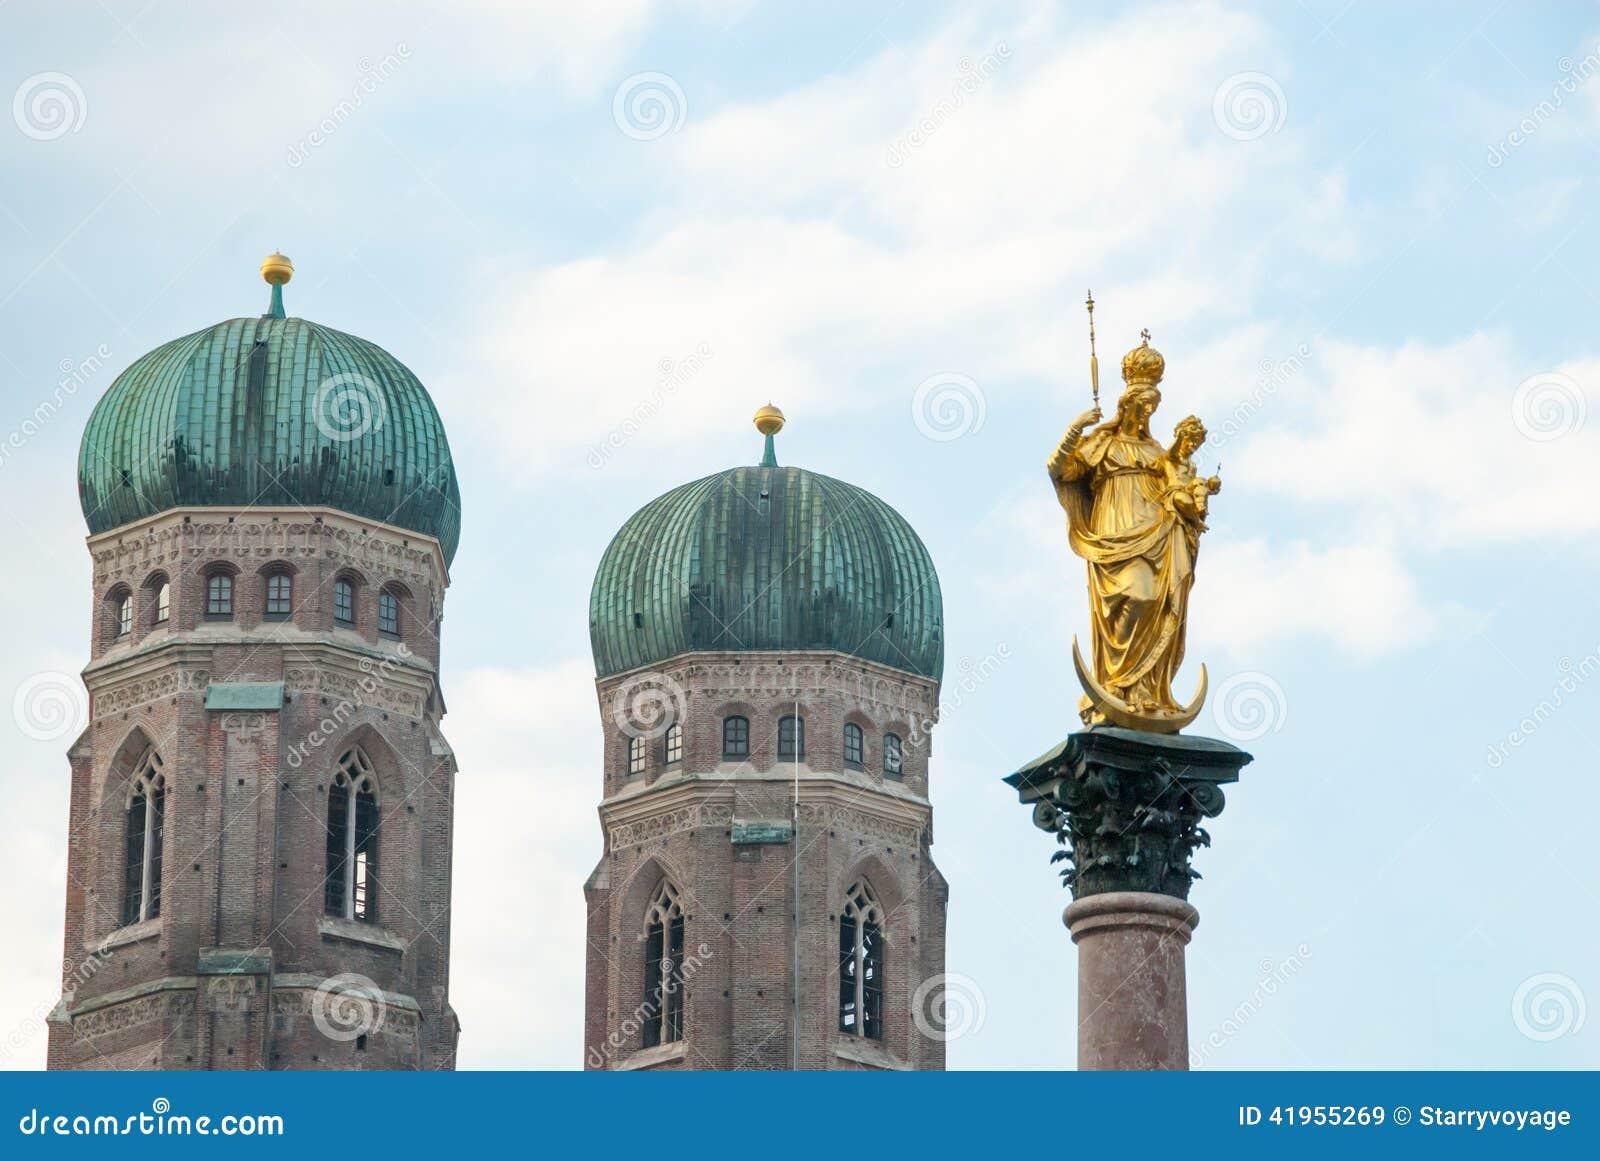 Mariańska kolumna, Marienplatz, Monachium, Niemcy